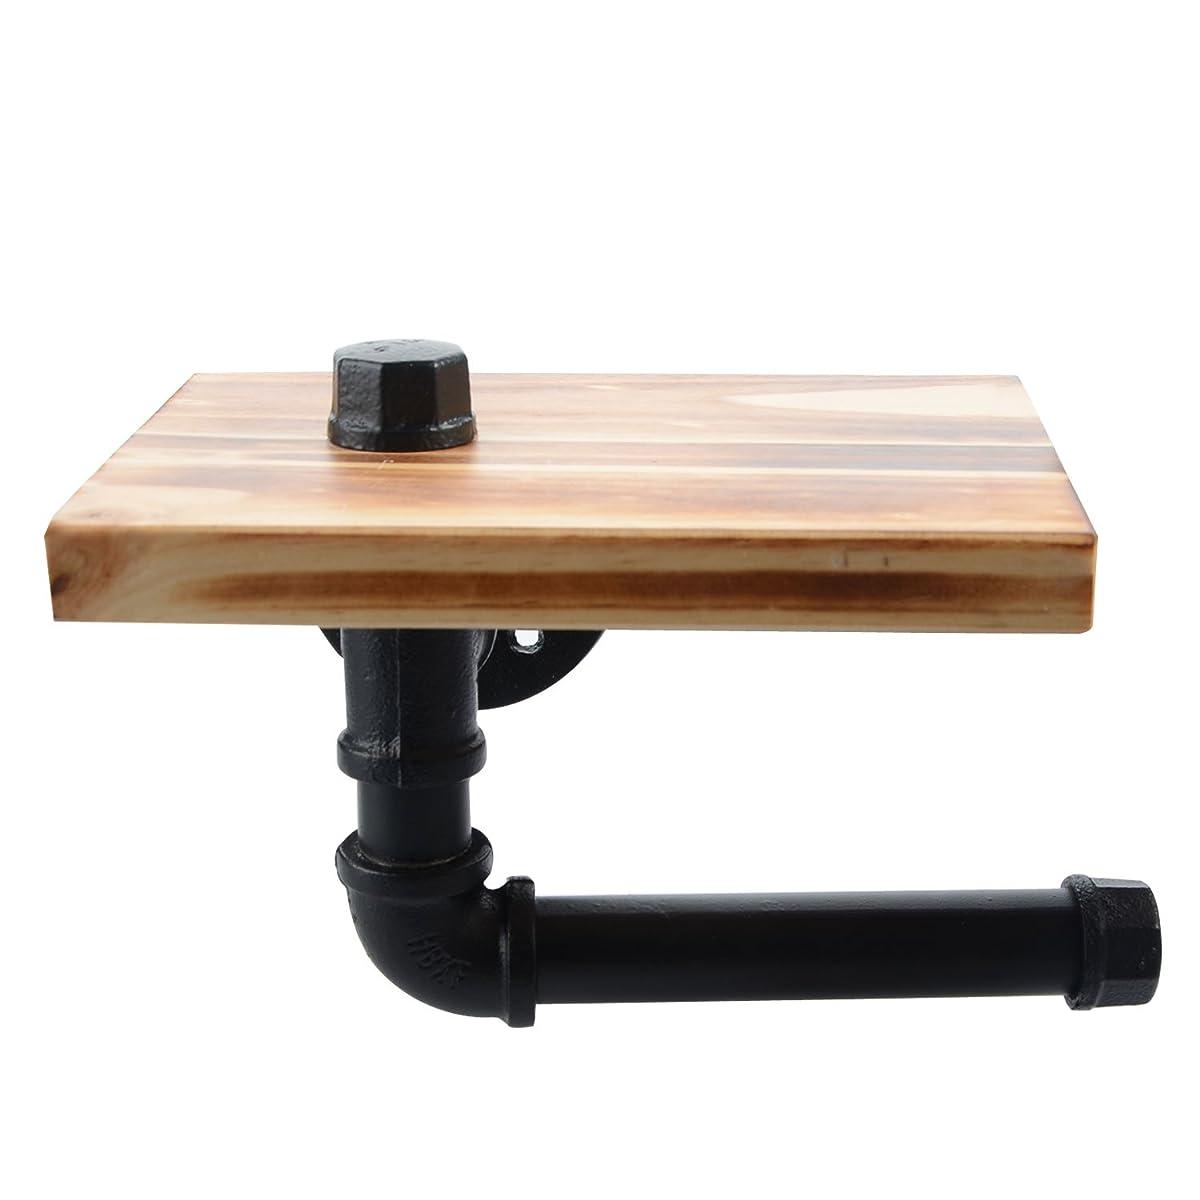 Toilet Paper Holder with Shelf, Industrial Iron Pipe Shelf/ Toilet Tissue Roll Holder - with Wooden Storage Wall Mounted Bathroom Shelf - Black